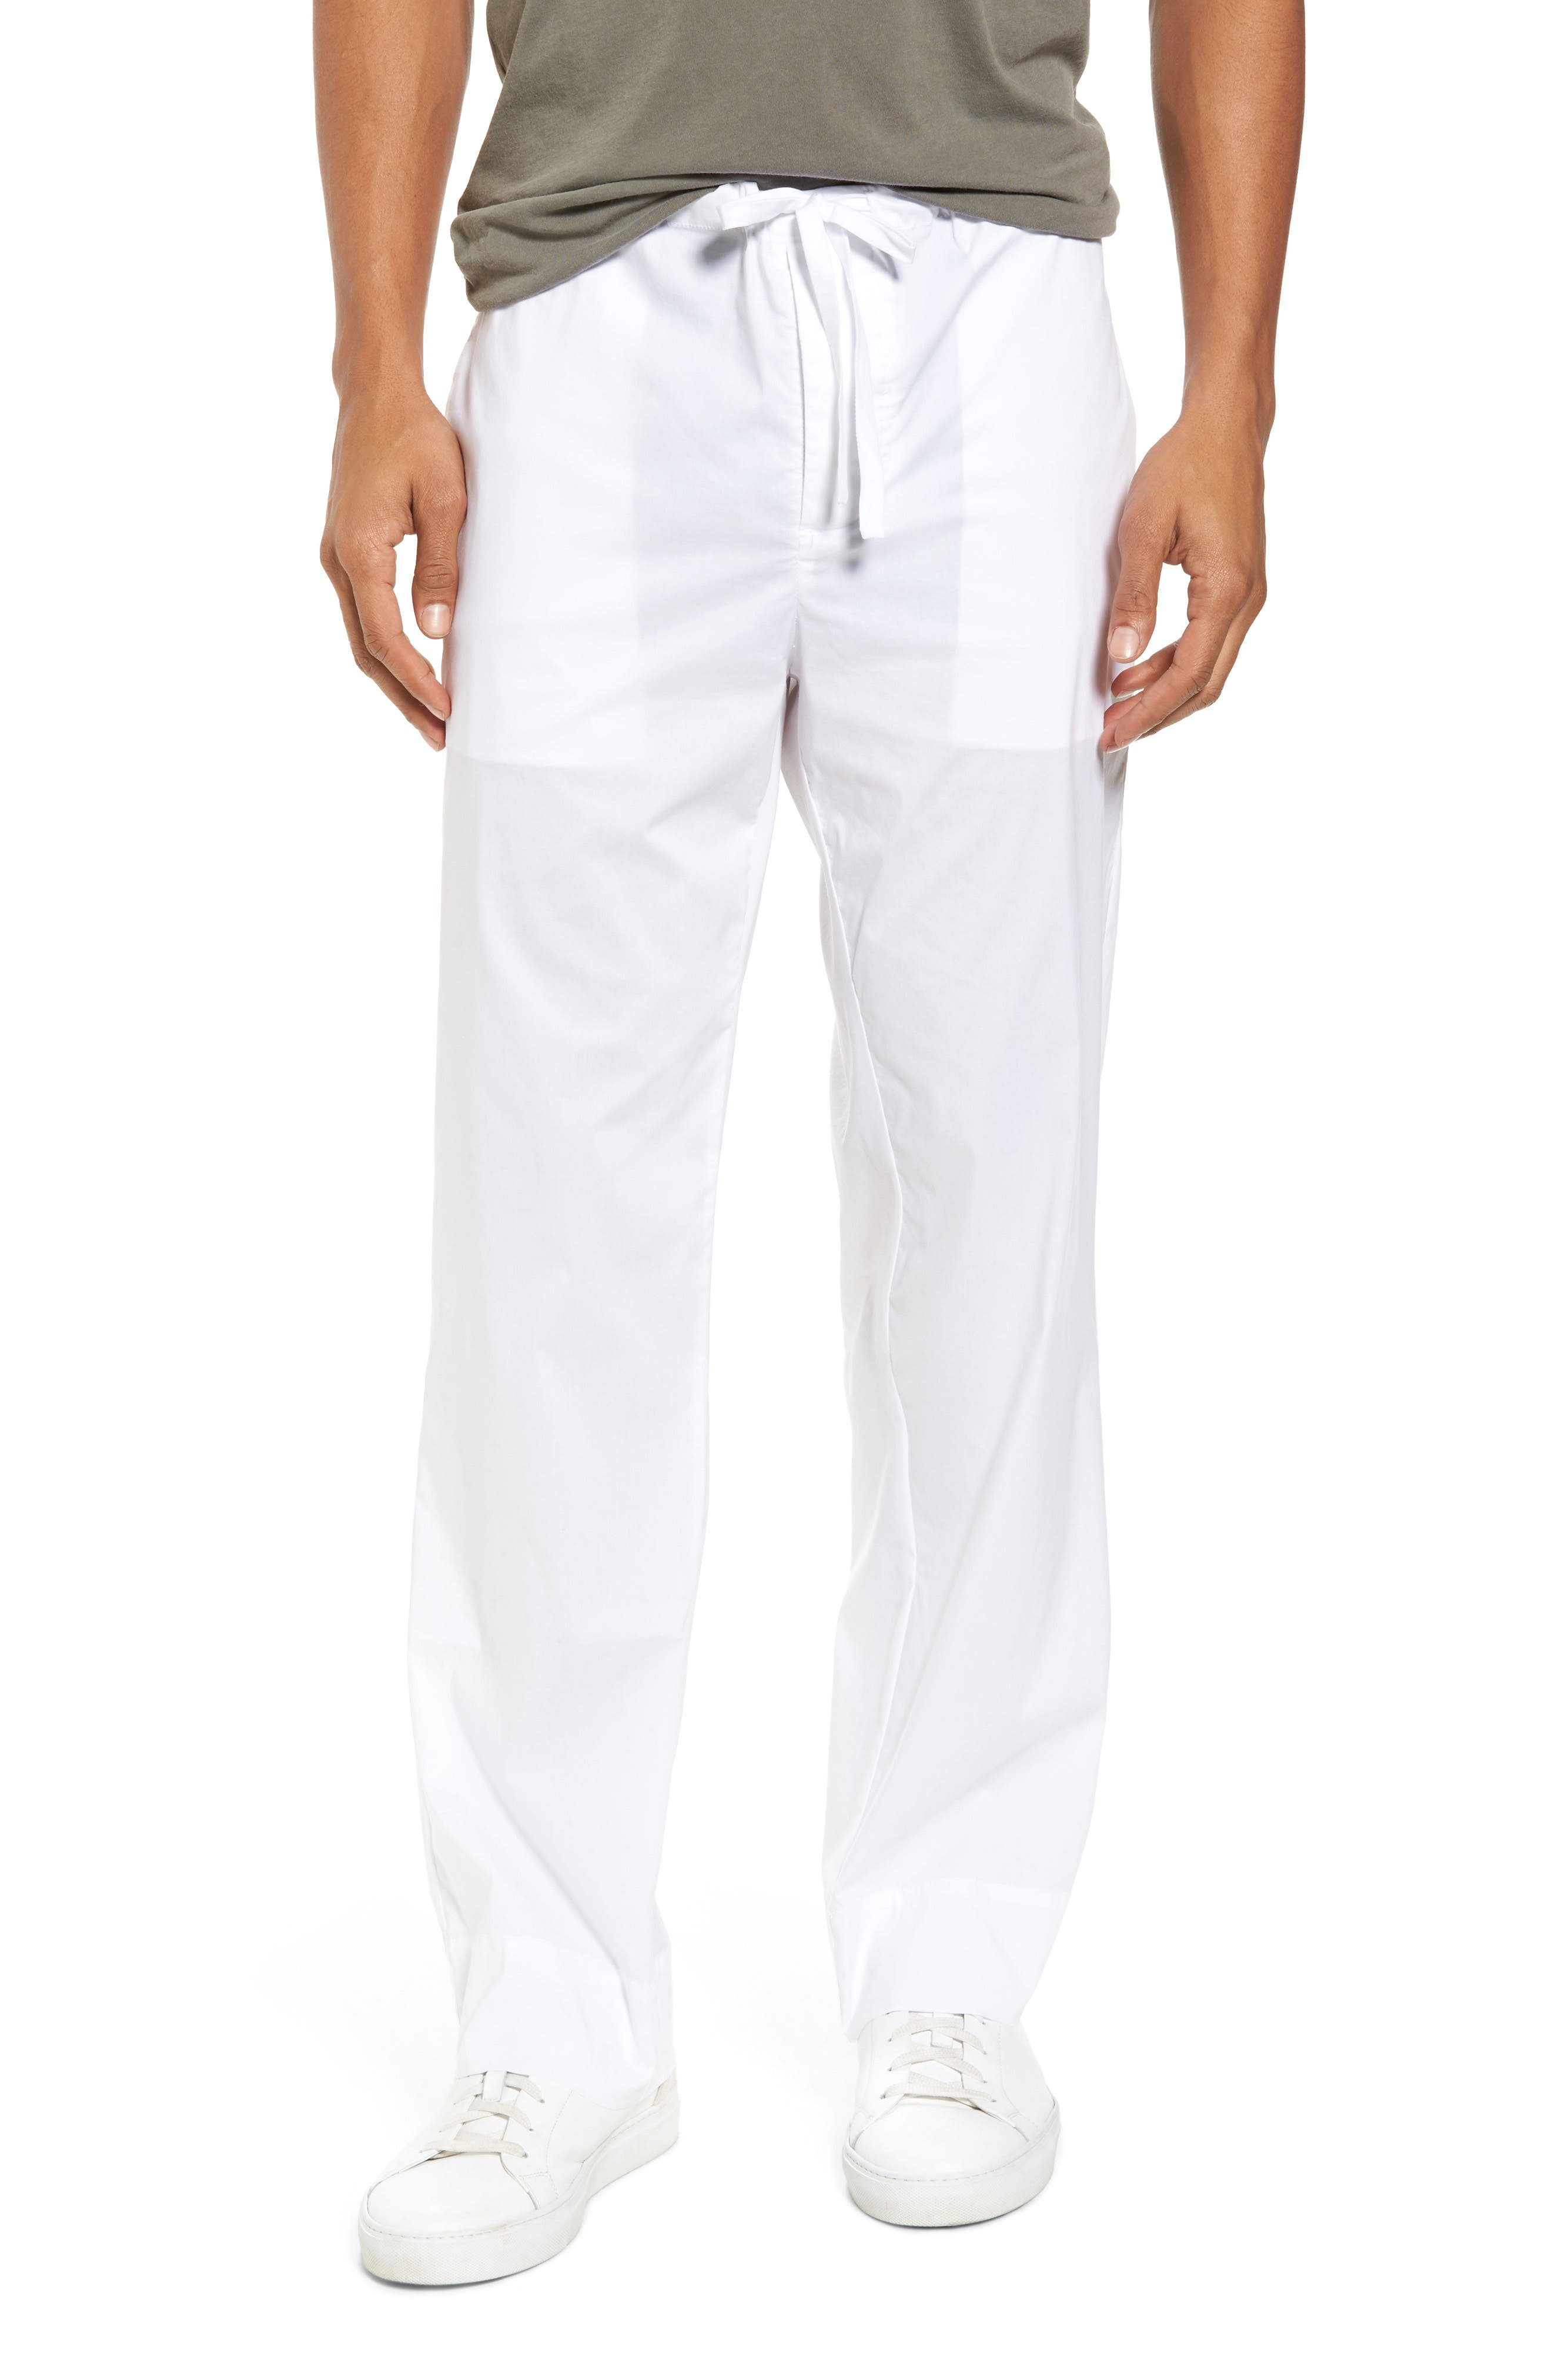 Drawstring Waist Pants,                         Main,                         color, White